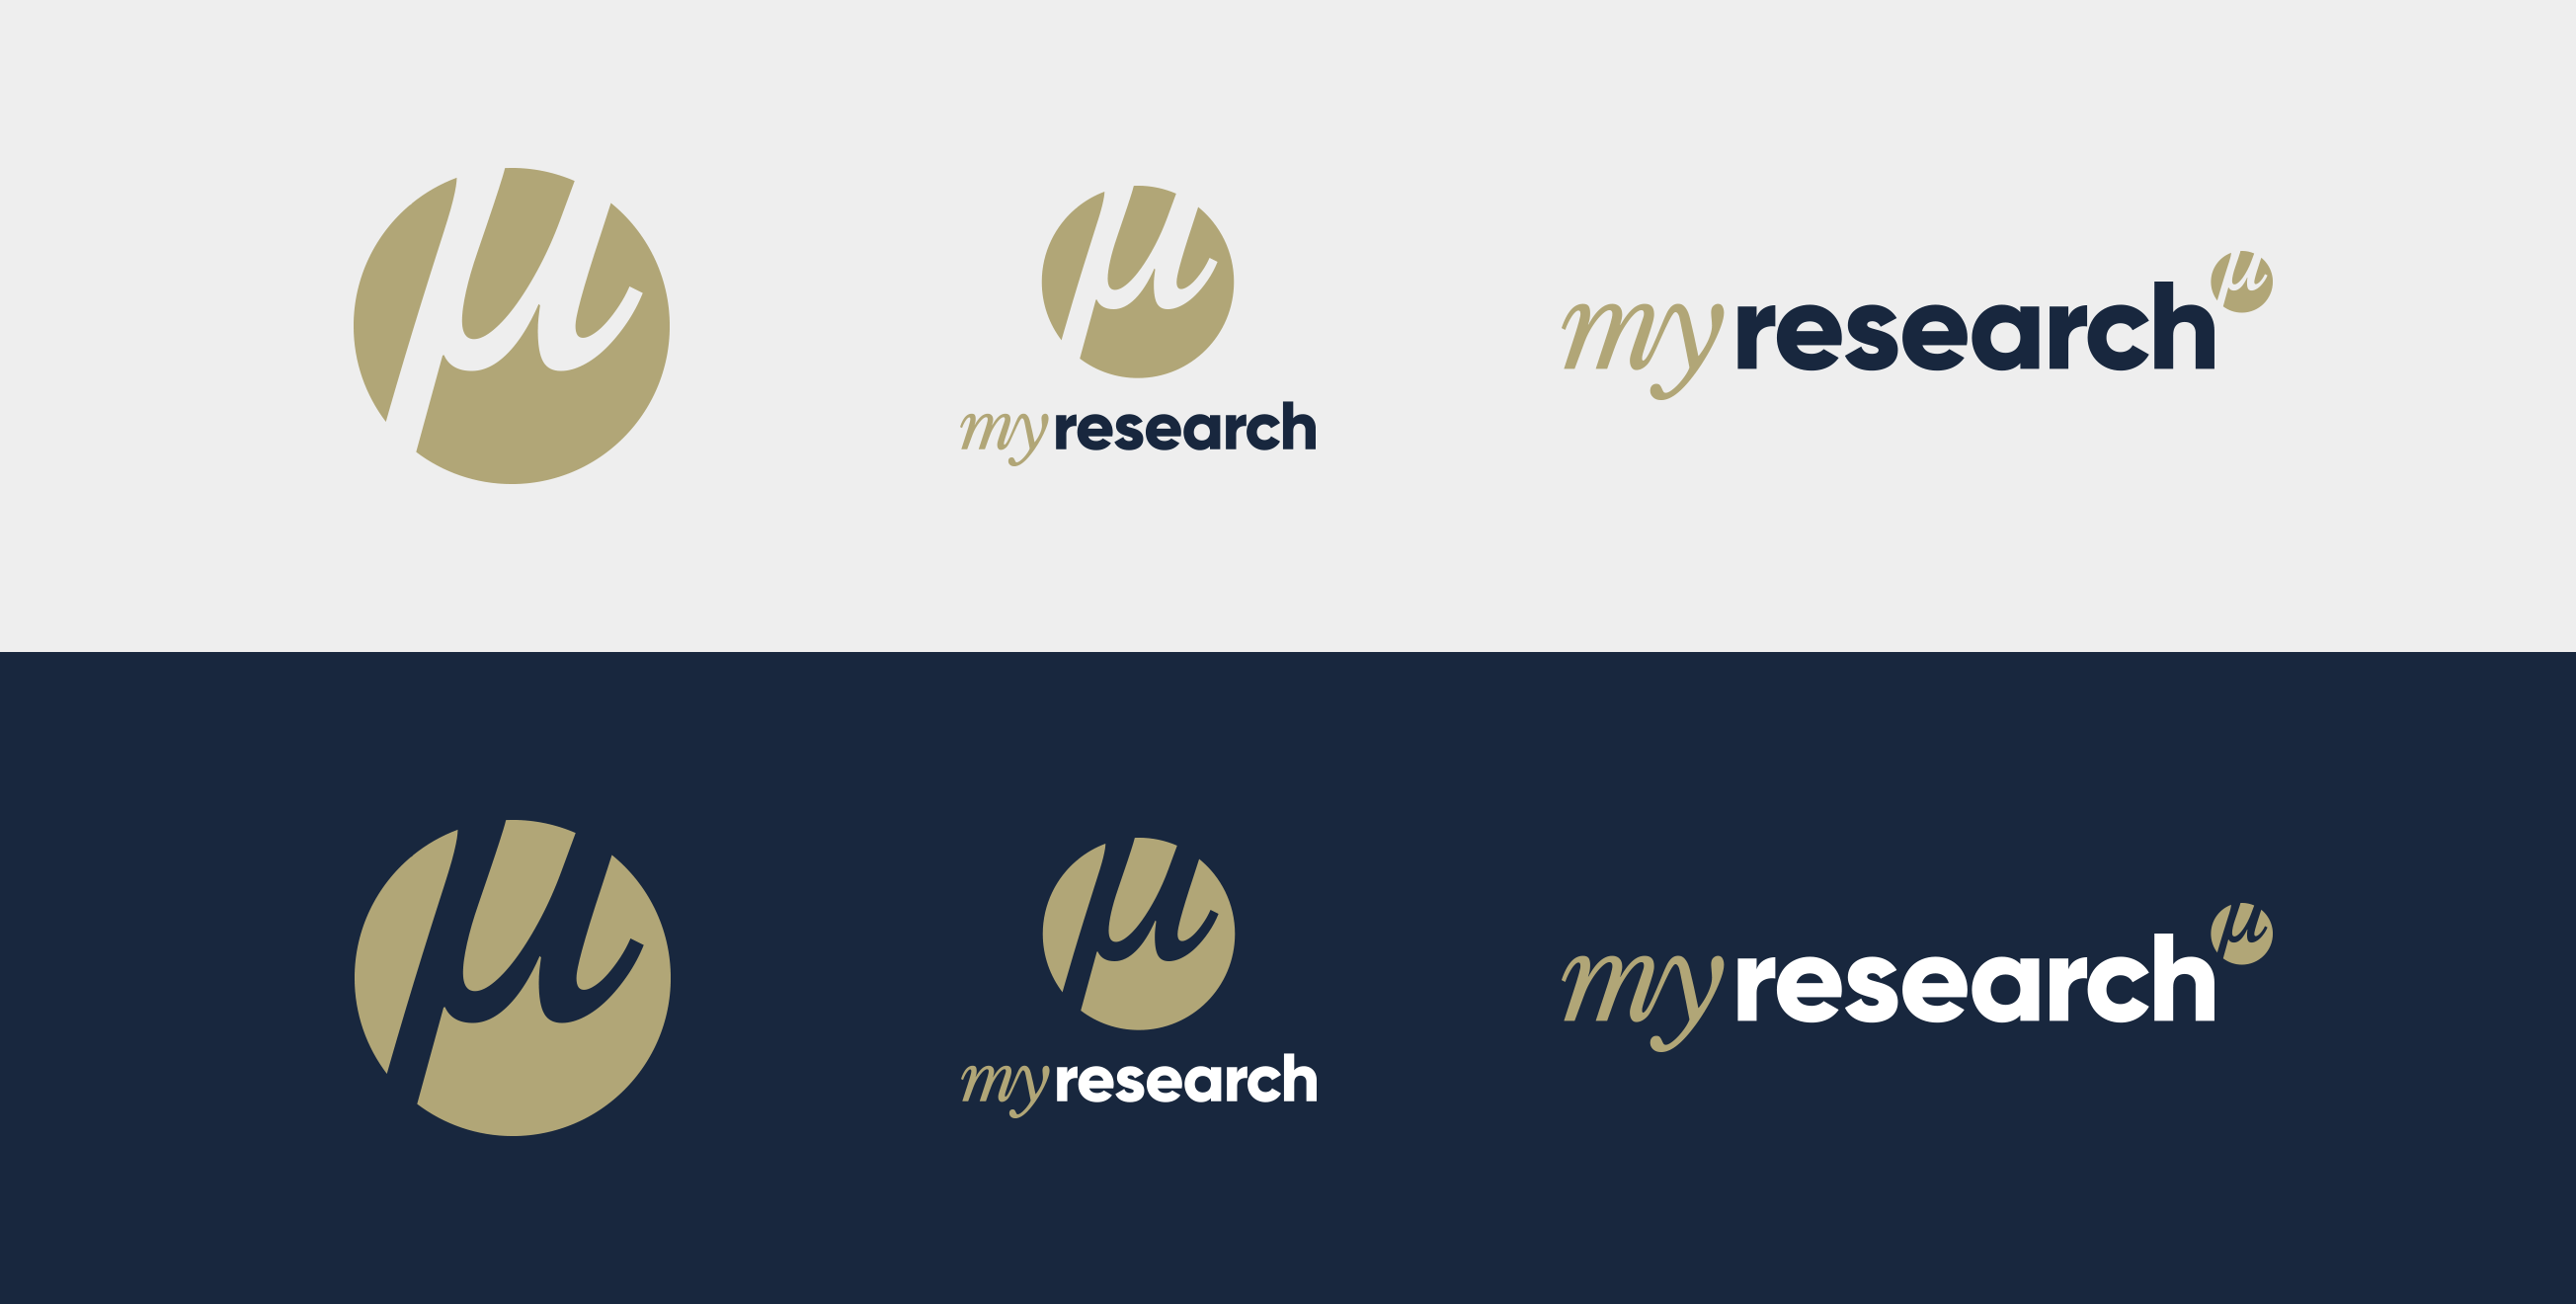 work__myresearch-05